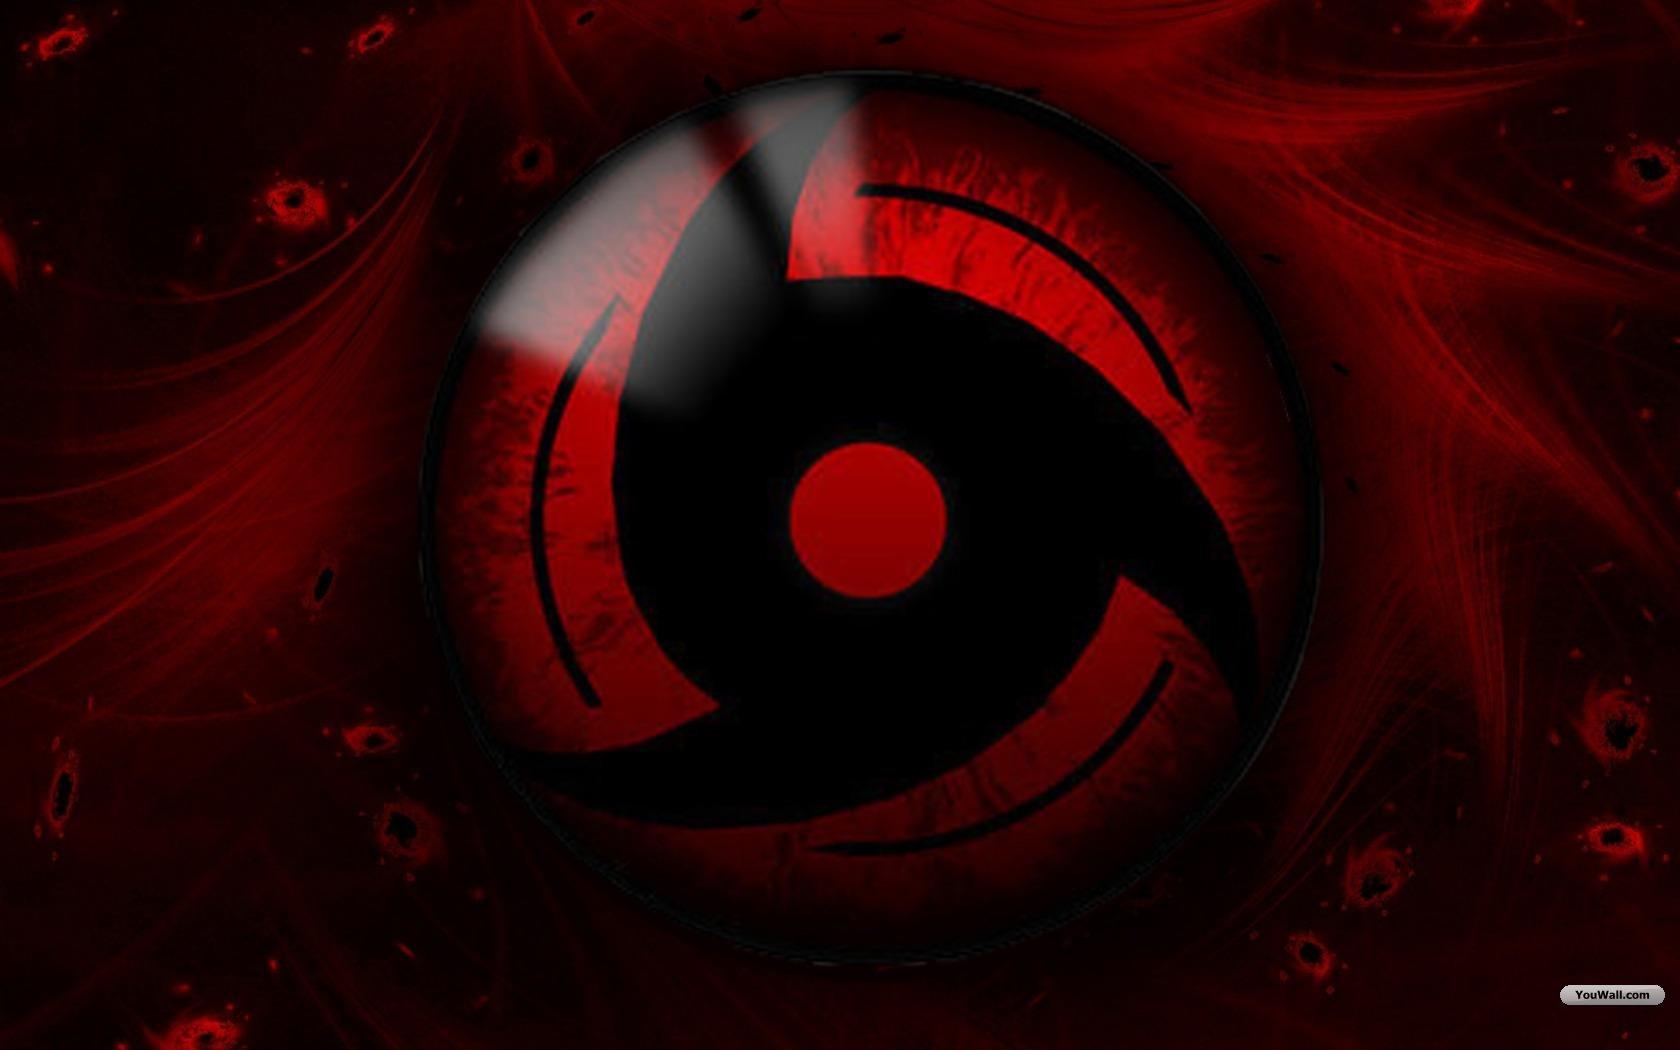 Wallpapers HD Naruto Shippuden Group